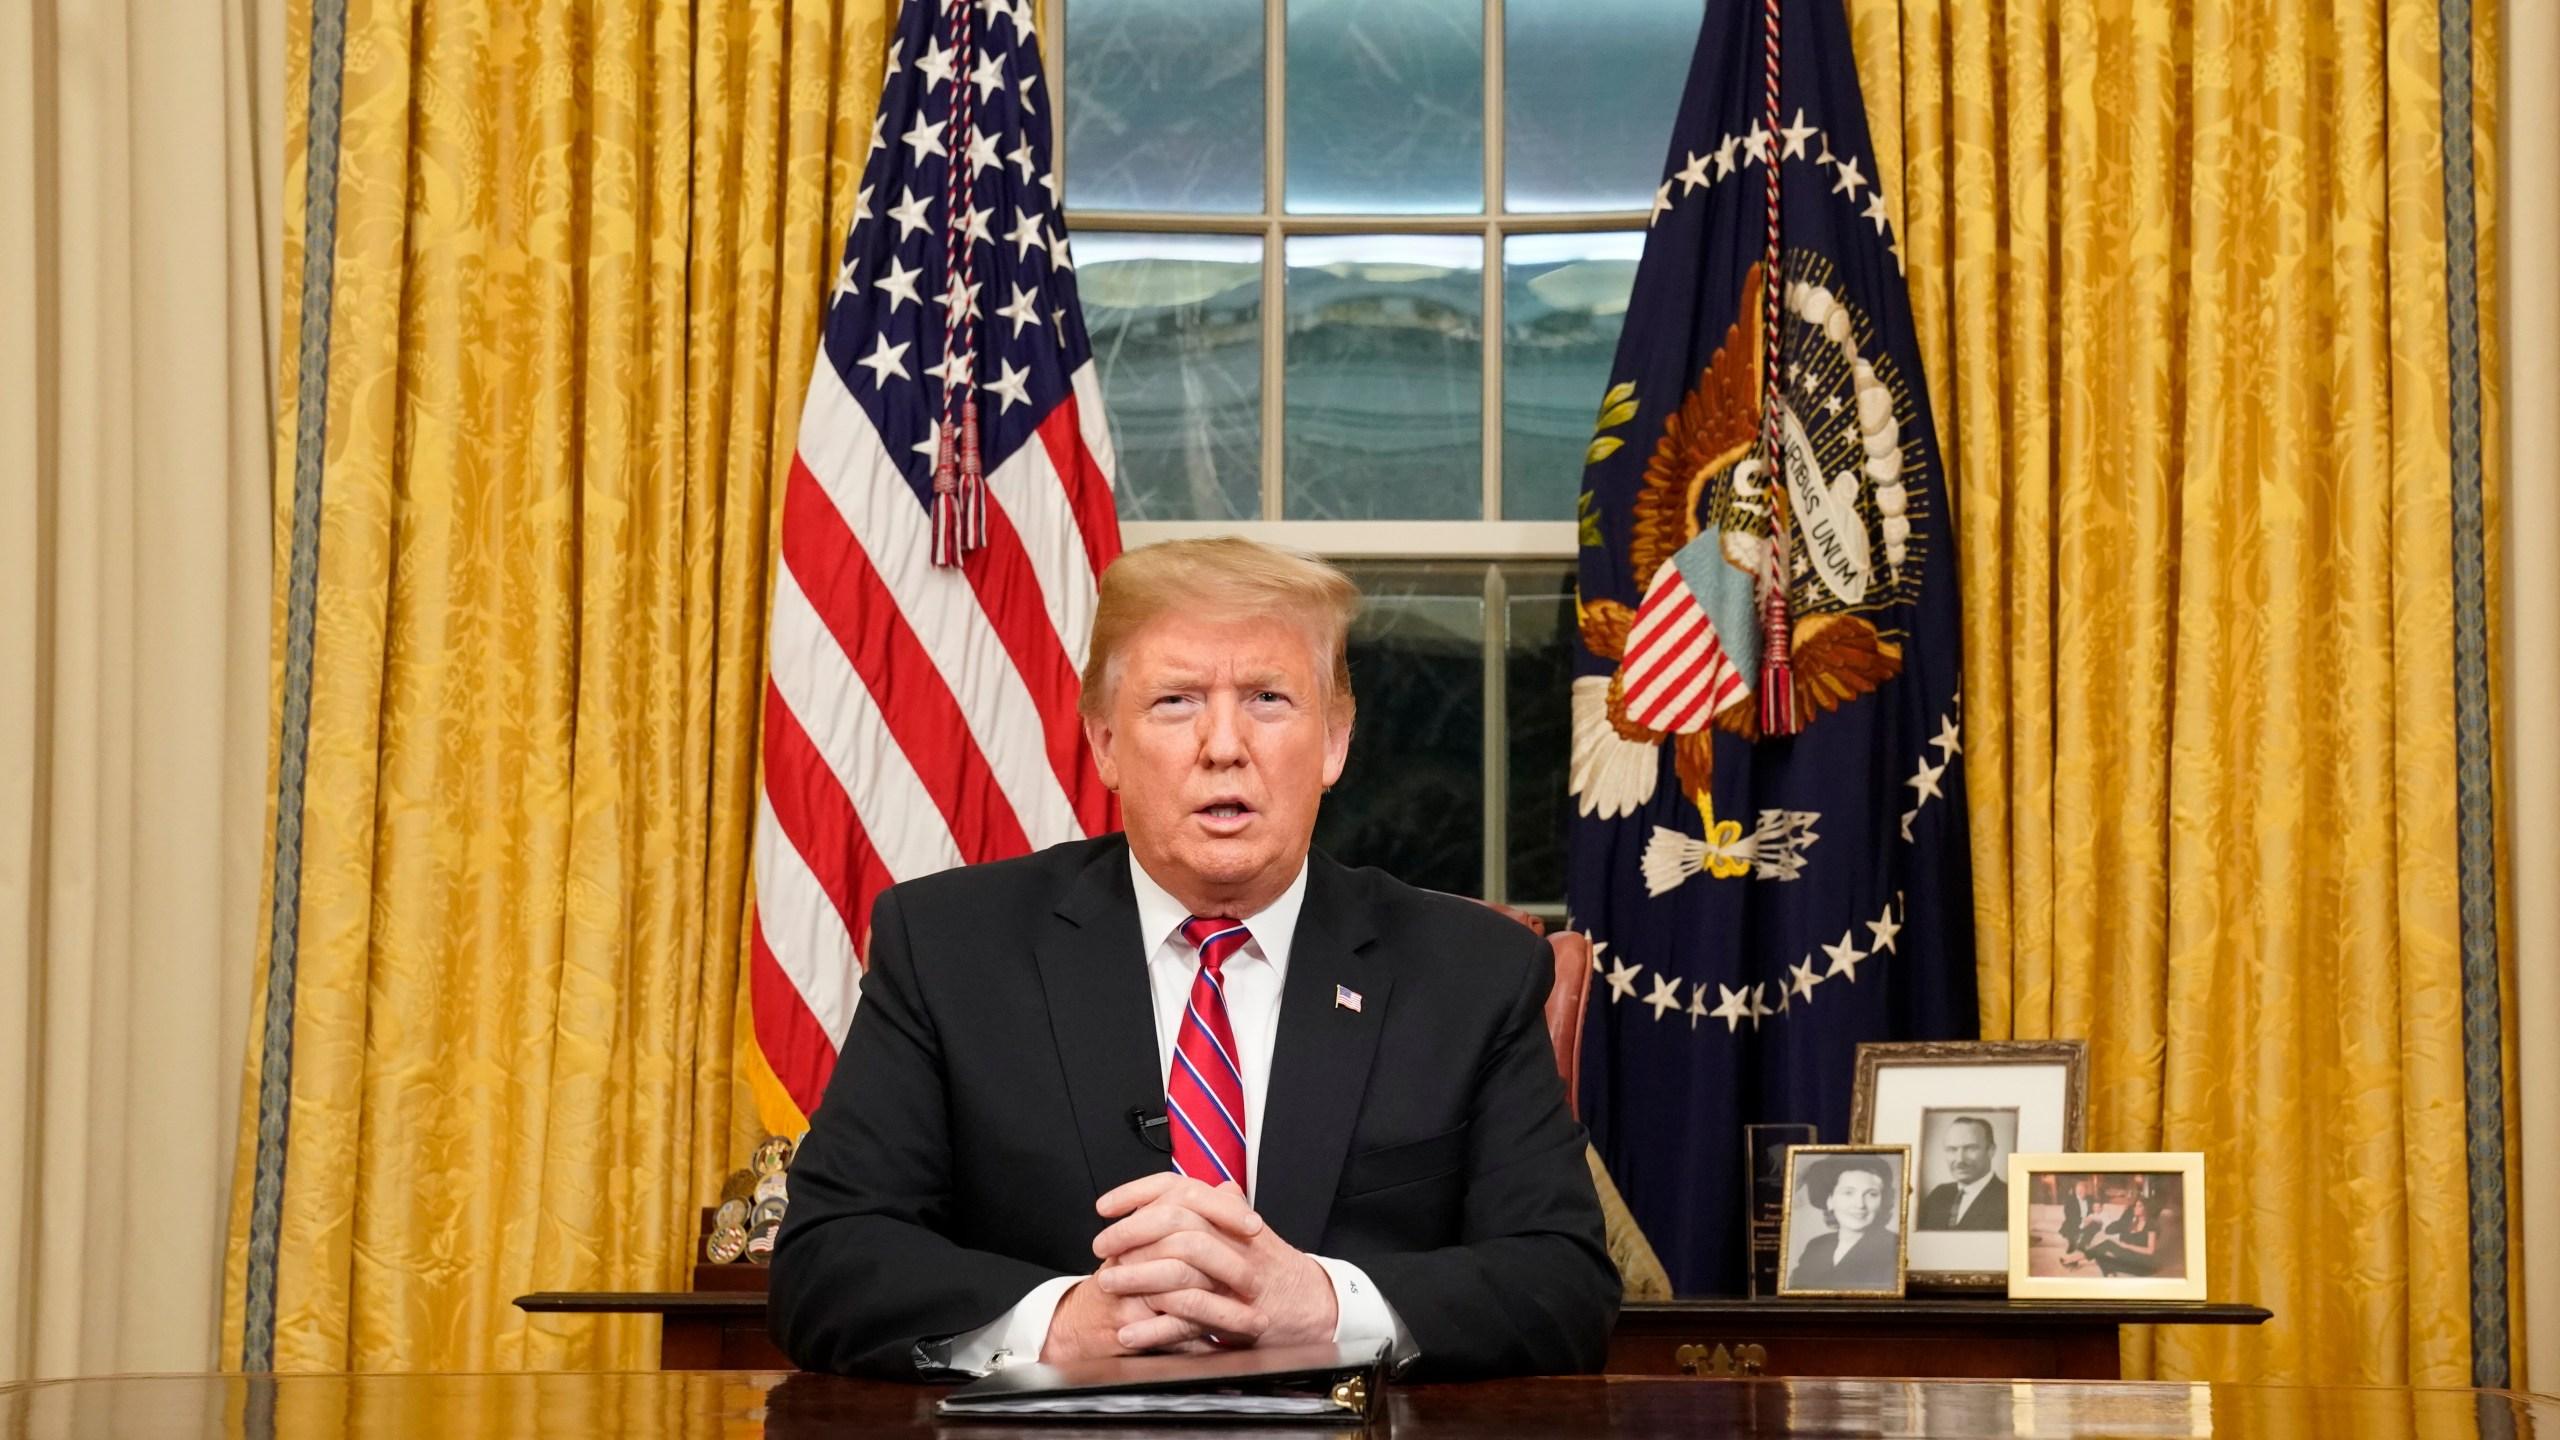 APTOPIX_Government_Shutdown_Trump_85773-159532.jpg57411370